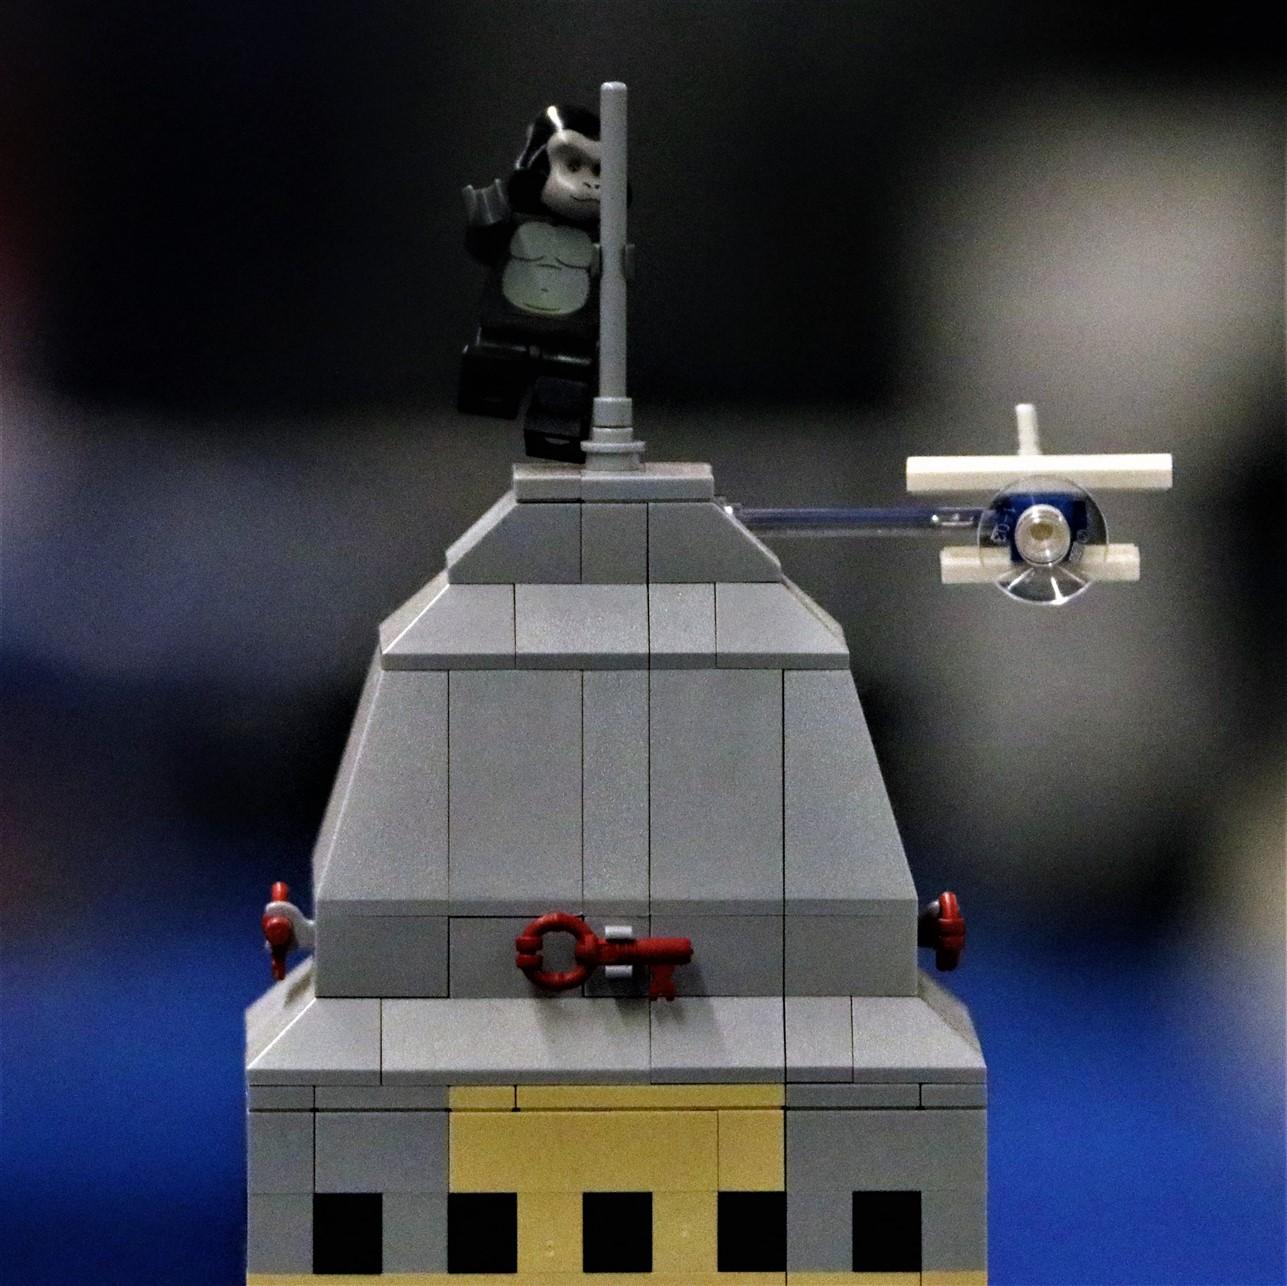 2017 09 30 103 Cleveland Lego Convention.jpg